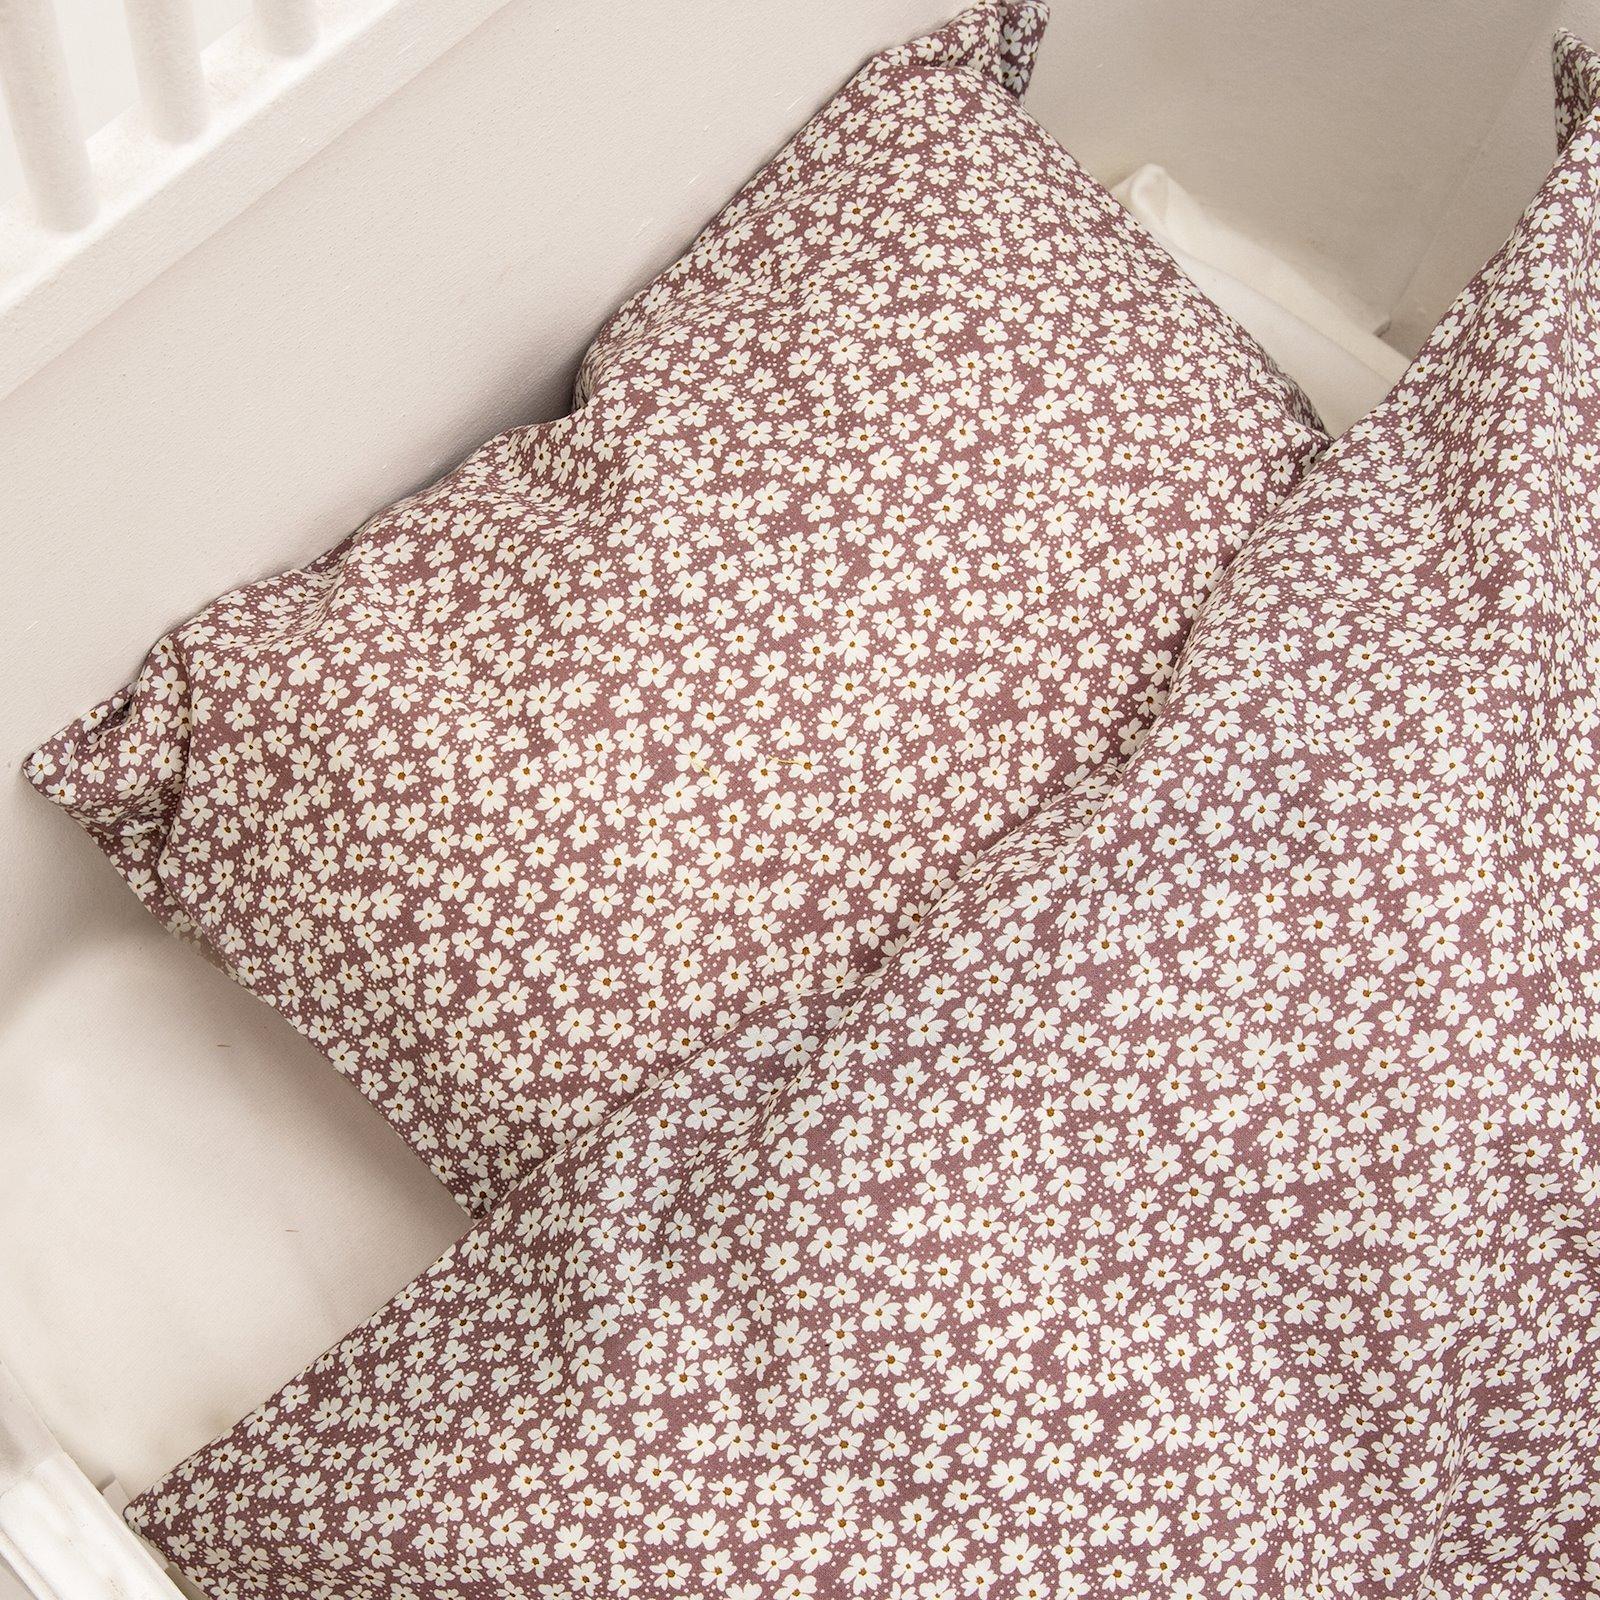 Bed linen p90076_780549_sskit